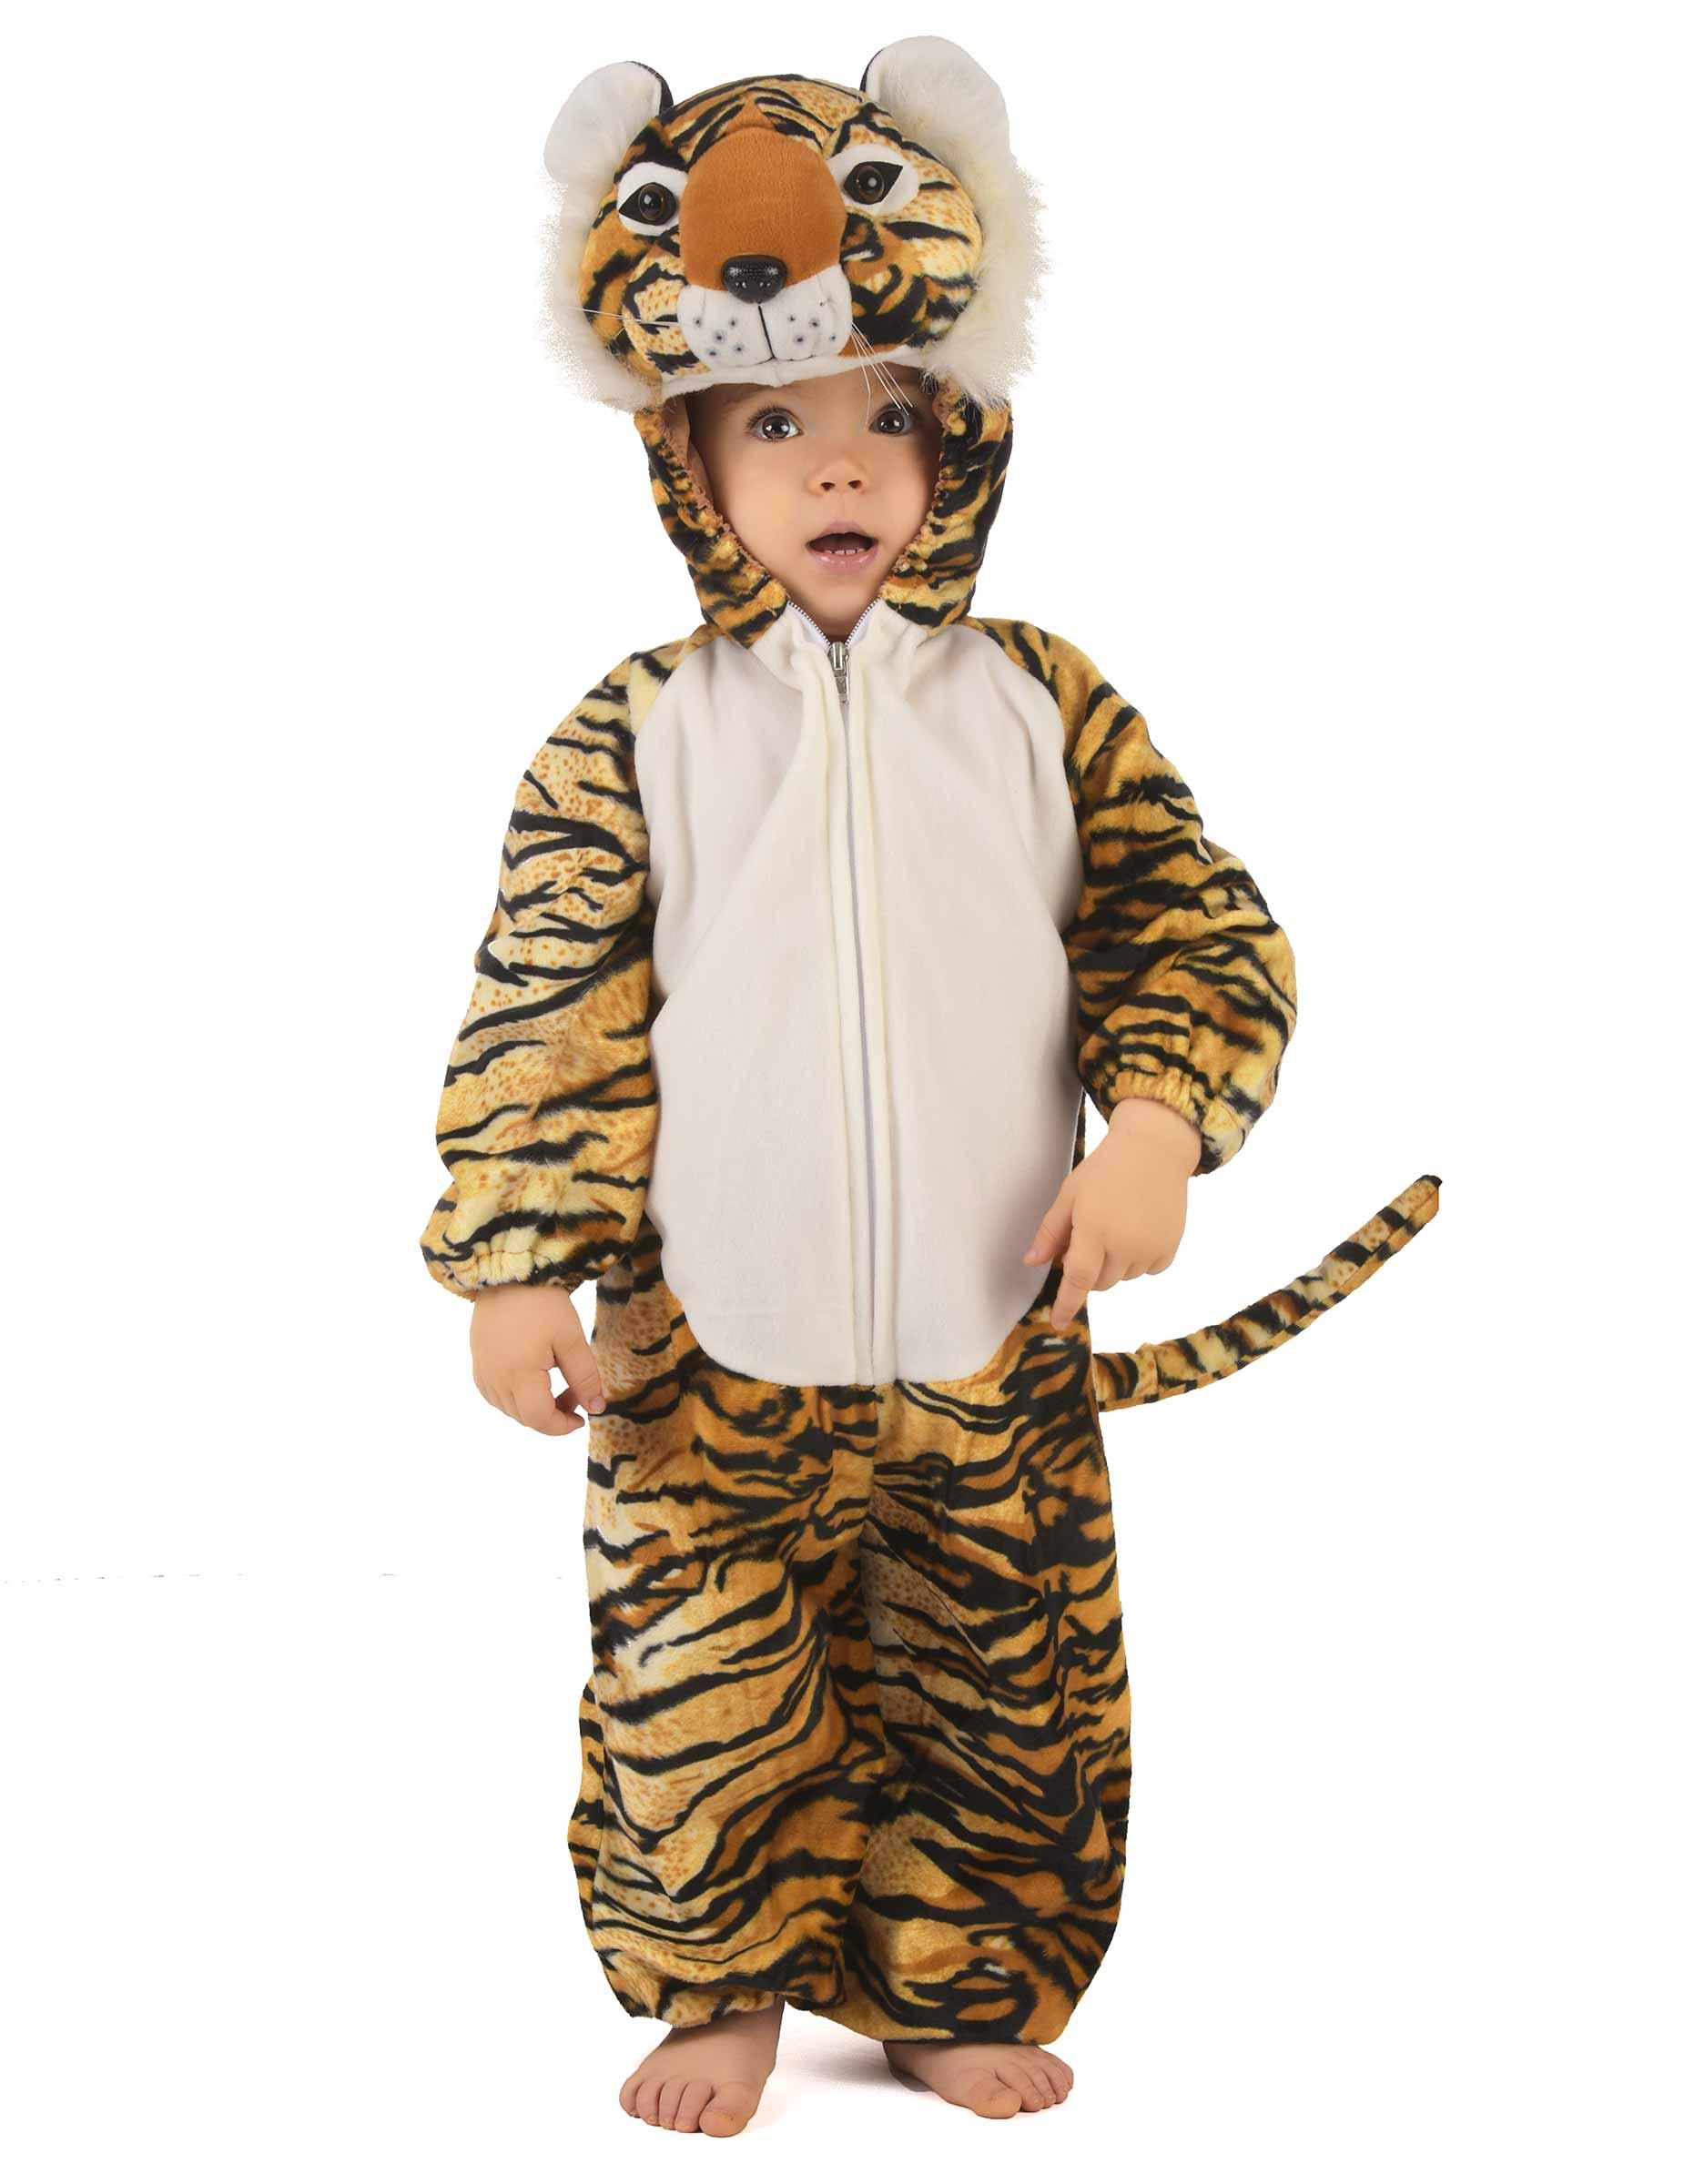 13c81a6d6a65 Vestiti di carnevale da animali per bambini - Vegaoo.it